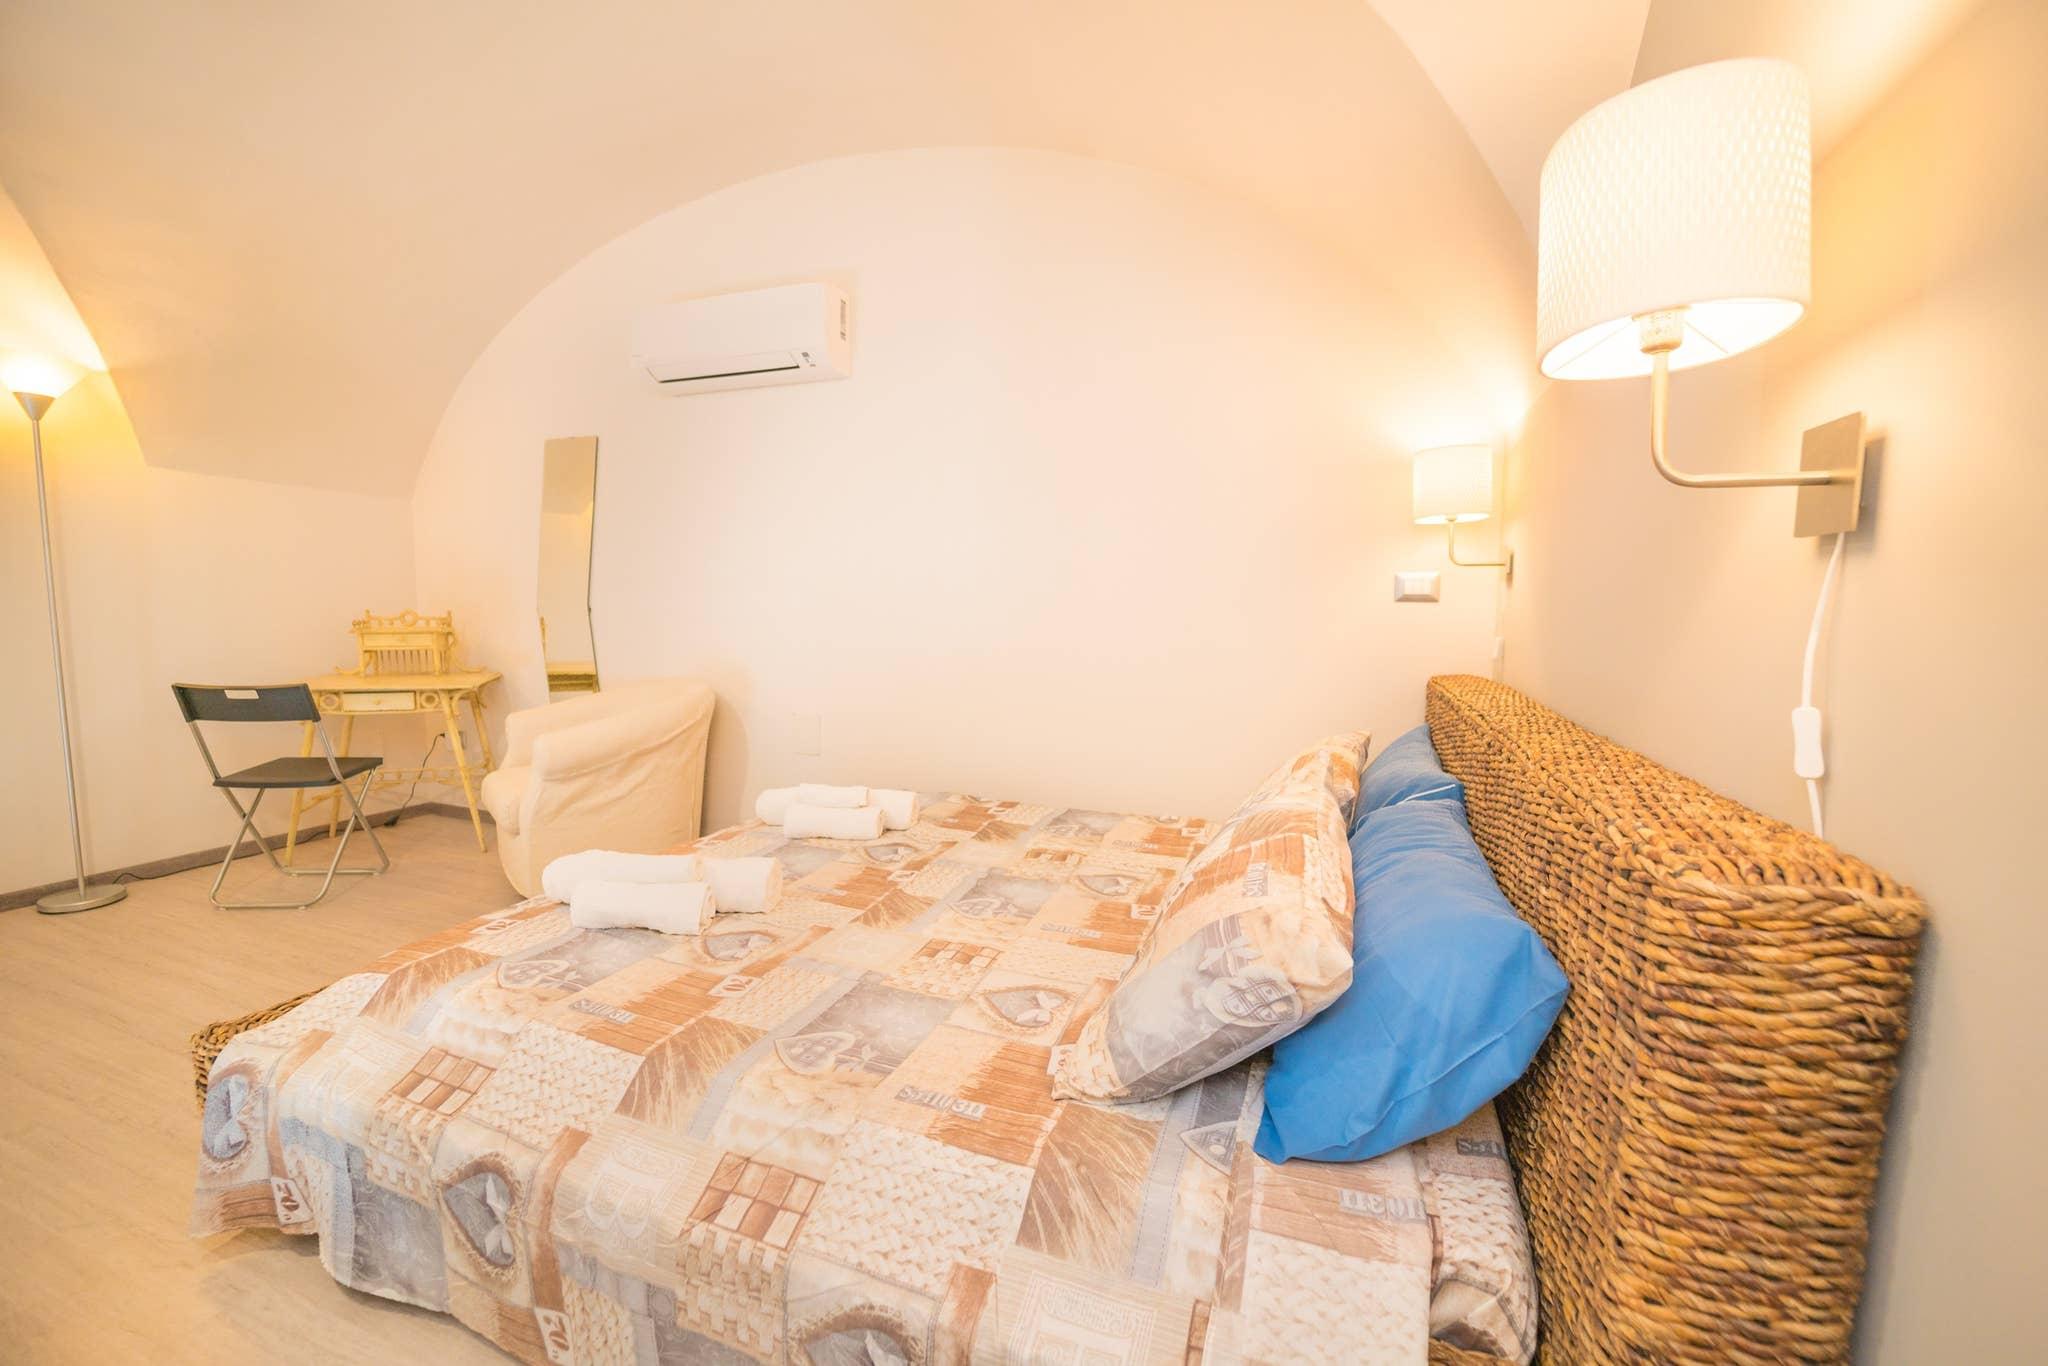 Maison de vacances  (2782175), Catania, Catania, Sicile, Italie, image 16